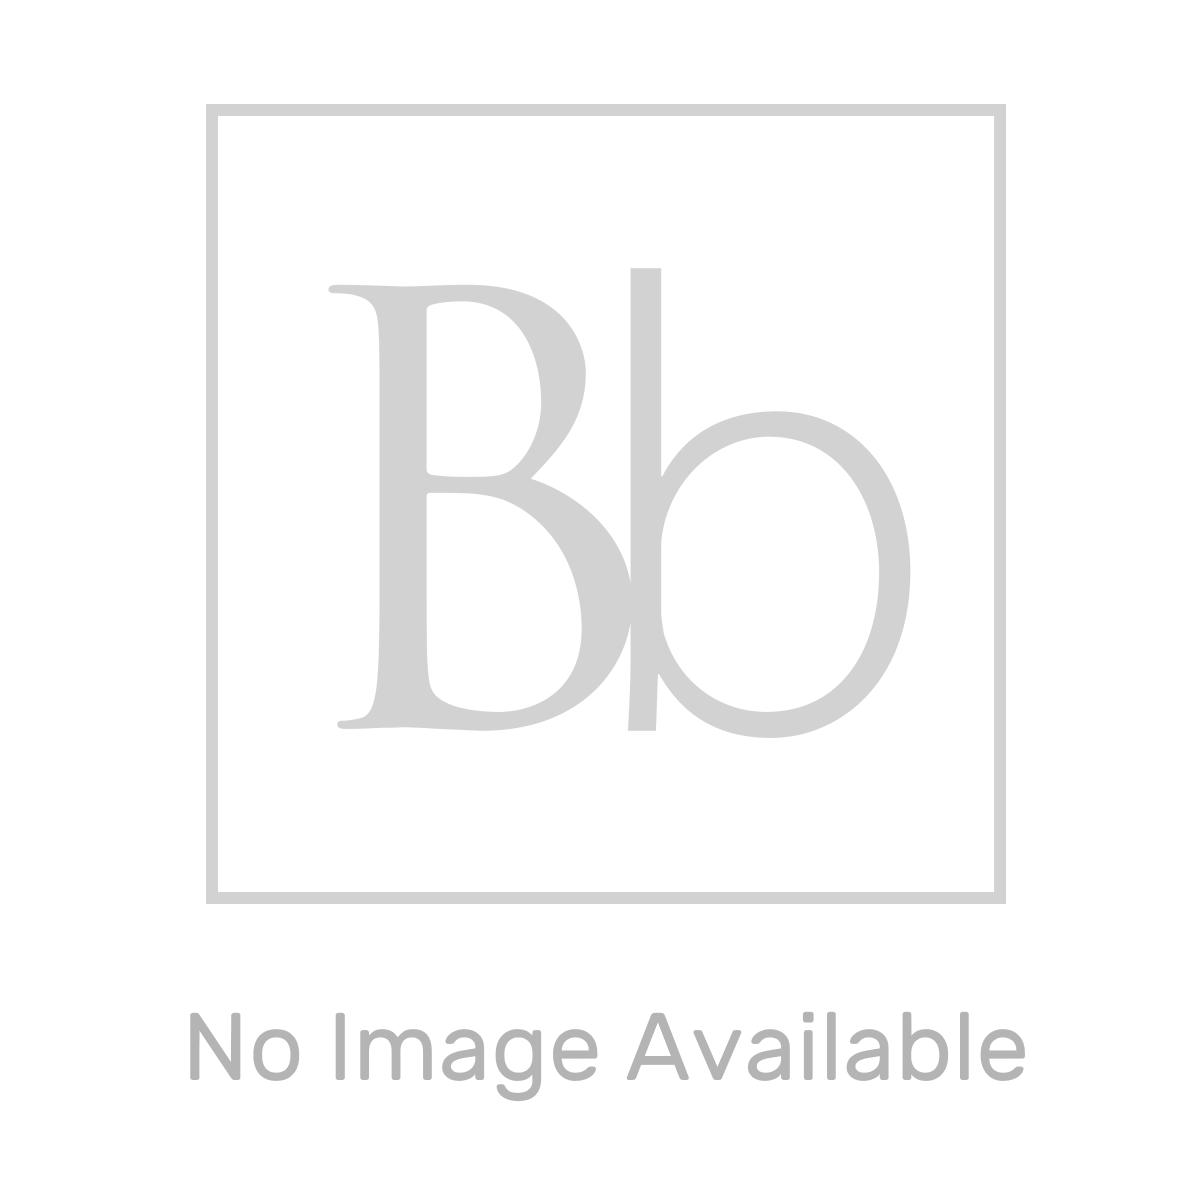 RAK Series 600 Back To Wall Toilet and 400 Series Gloss White Mini Vanity Unit Drawing